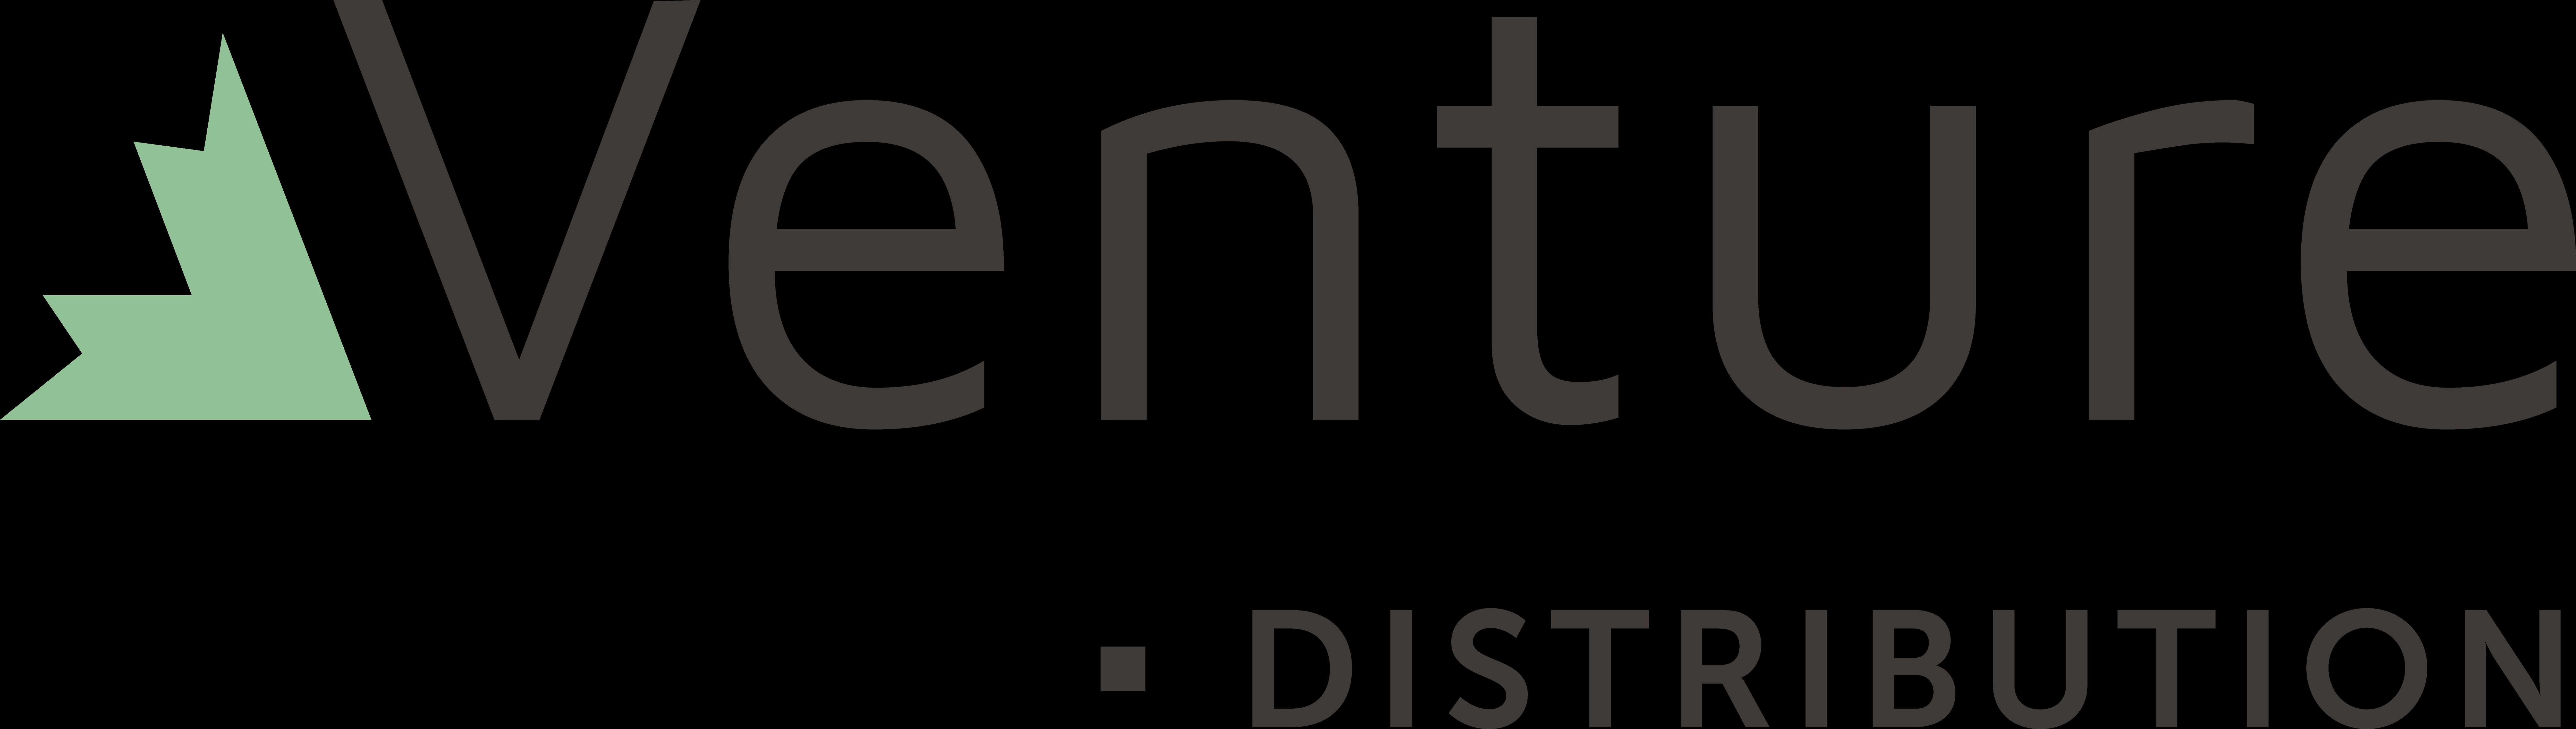 Venture Contract